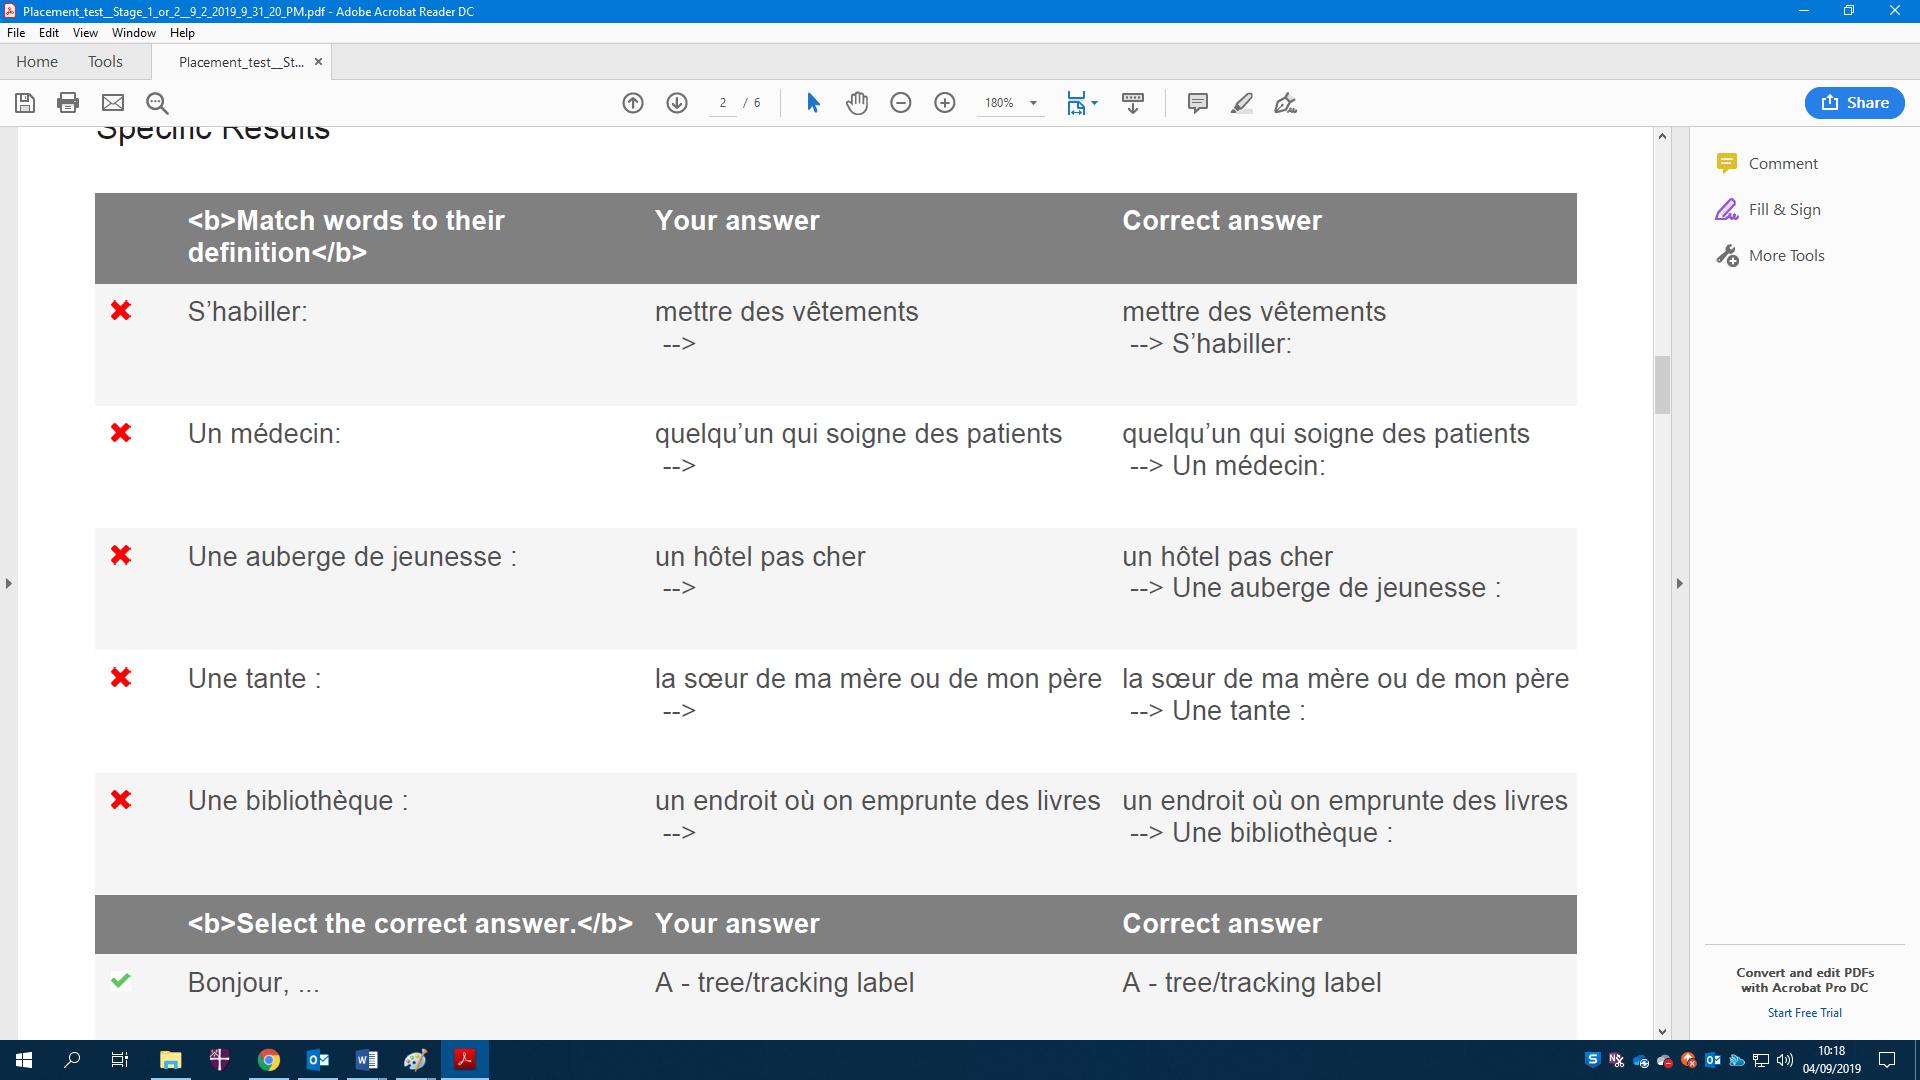 ResultspageMatchingtexts.png